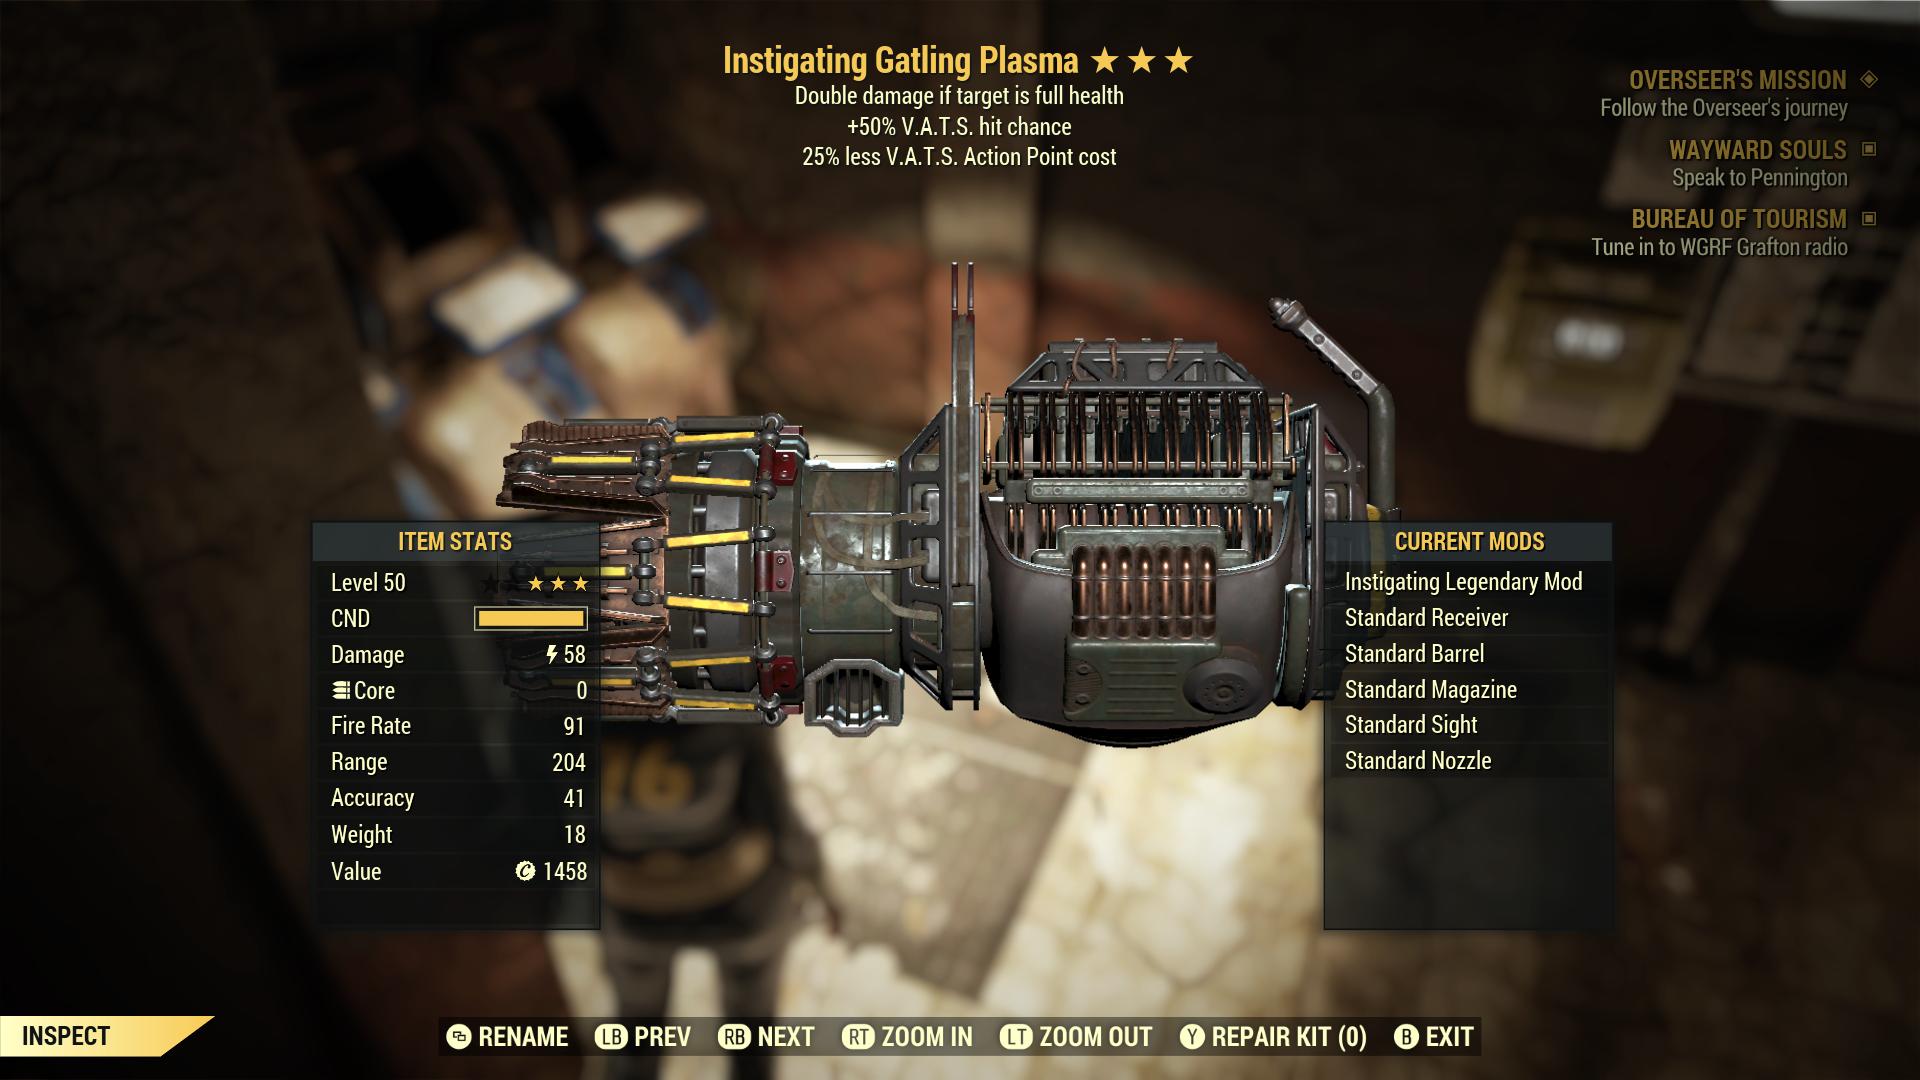 (New86)Instigating Gatling Plasma - Level 50